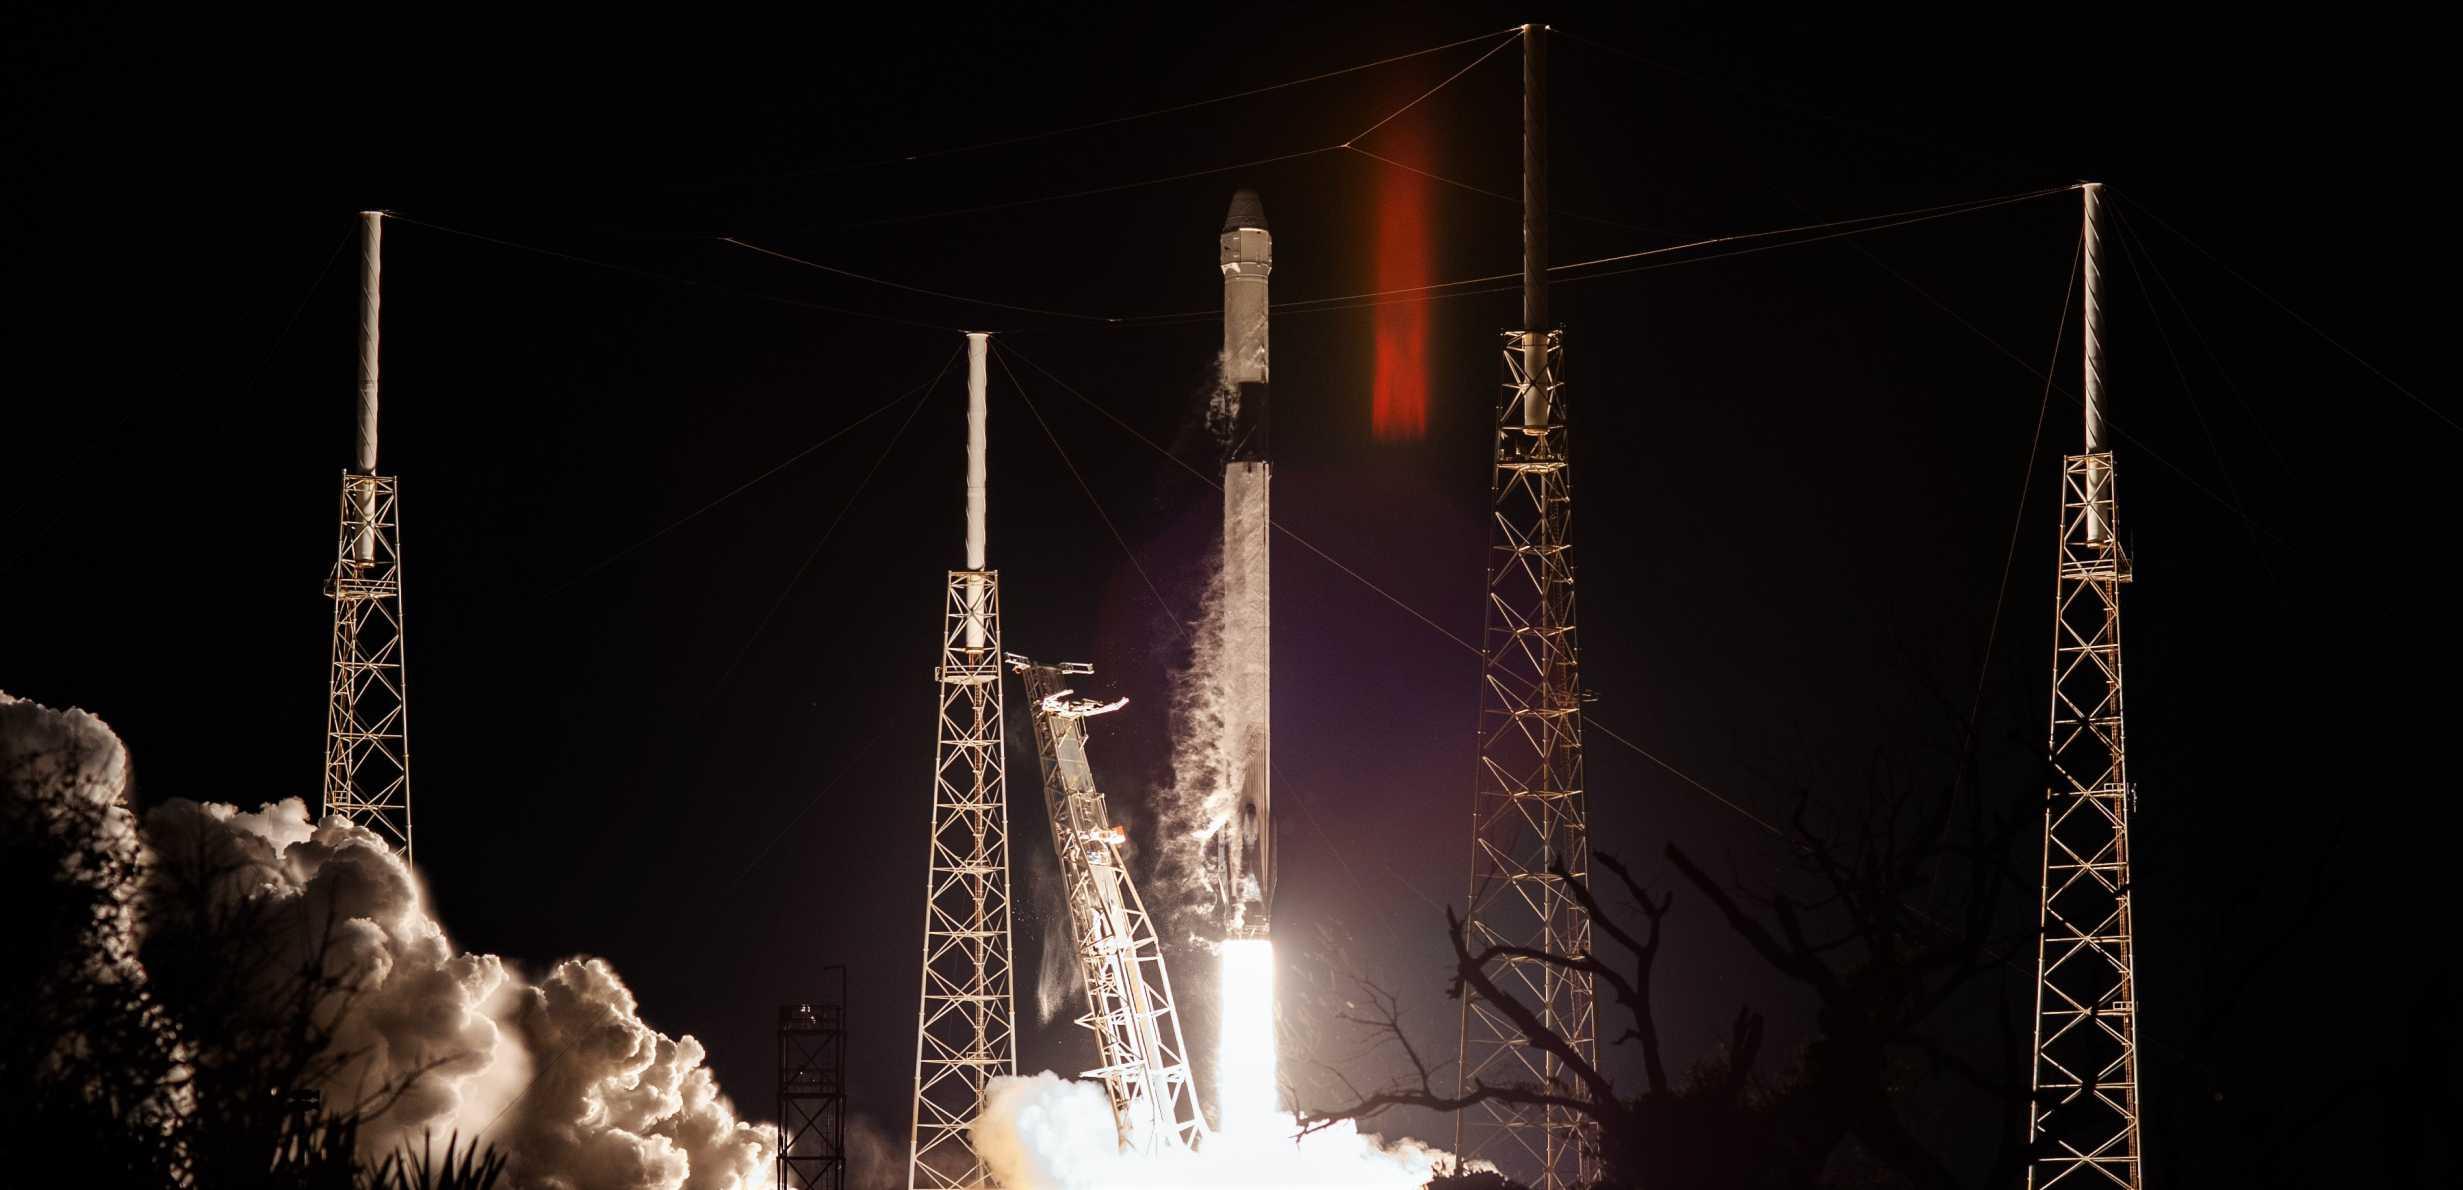 CRS-20 Dragon C112 F9 B1059 030720 (NASA) launch 1 crop (c)